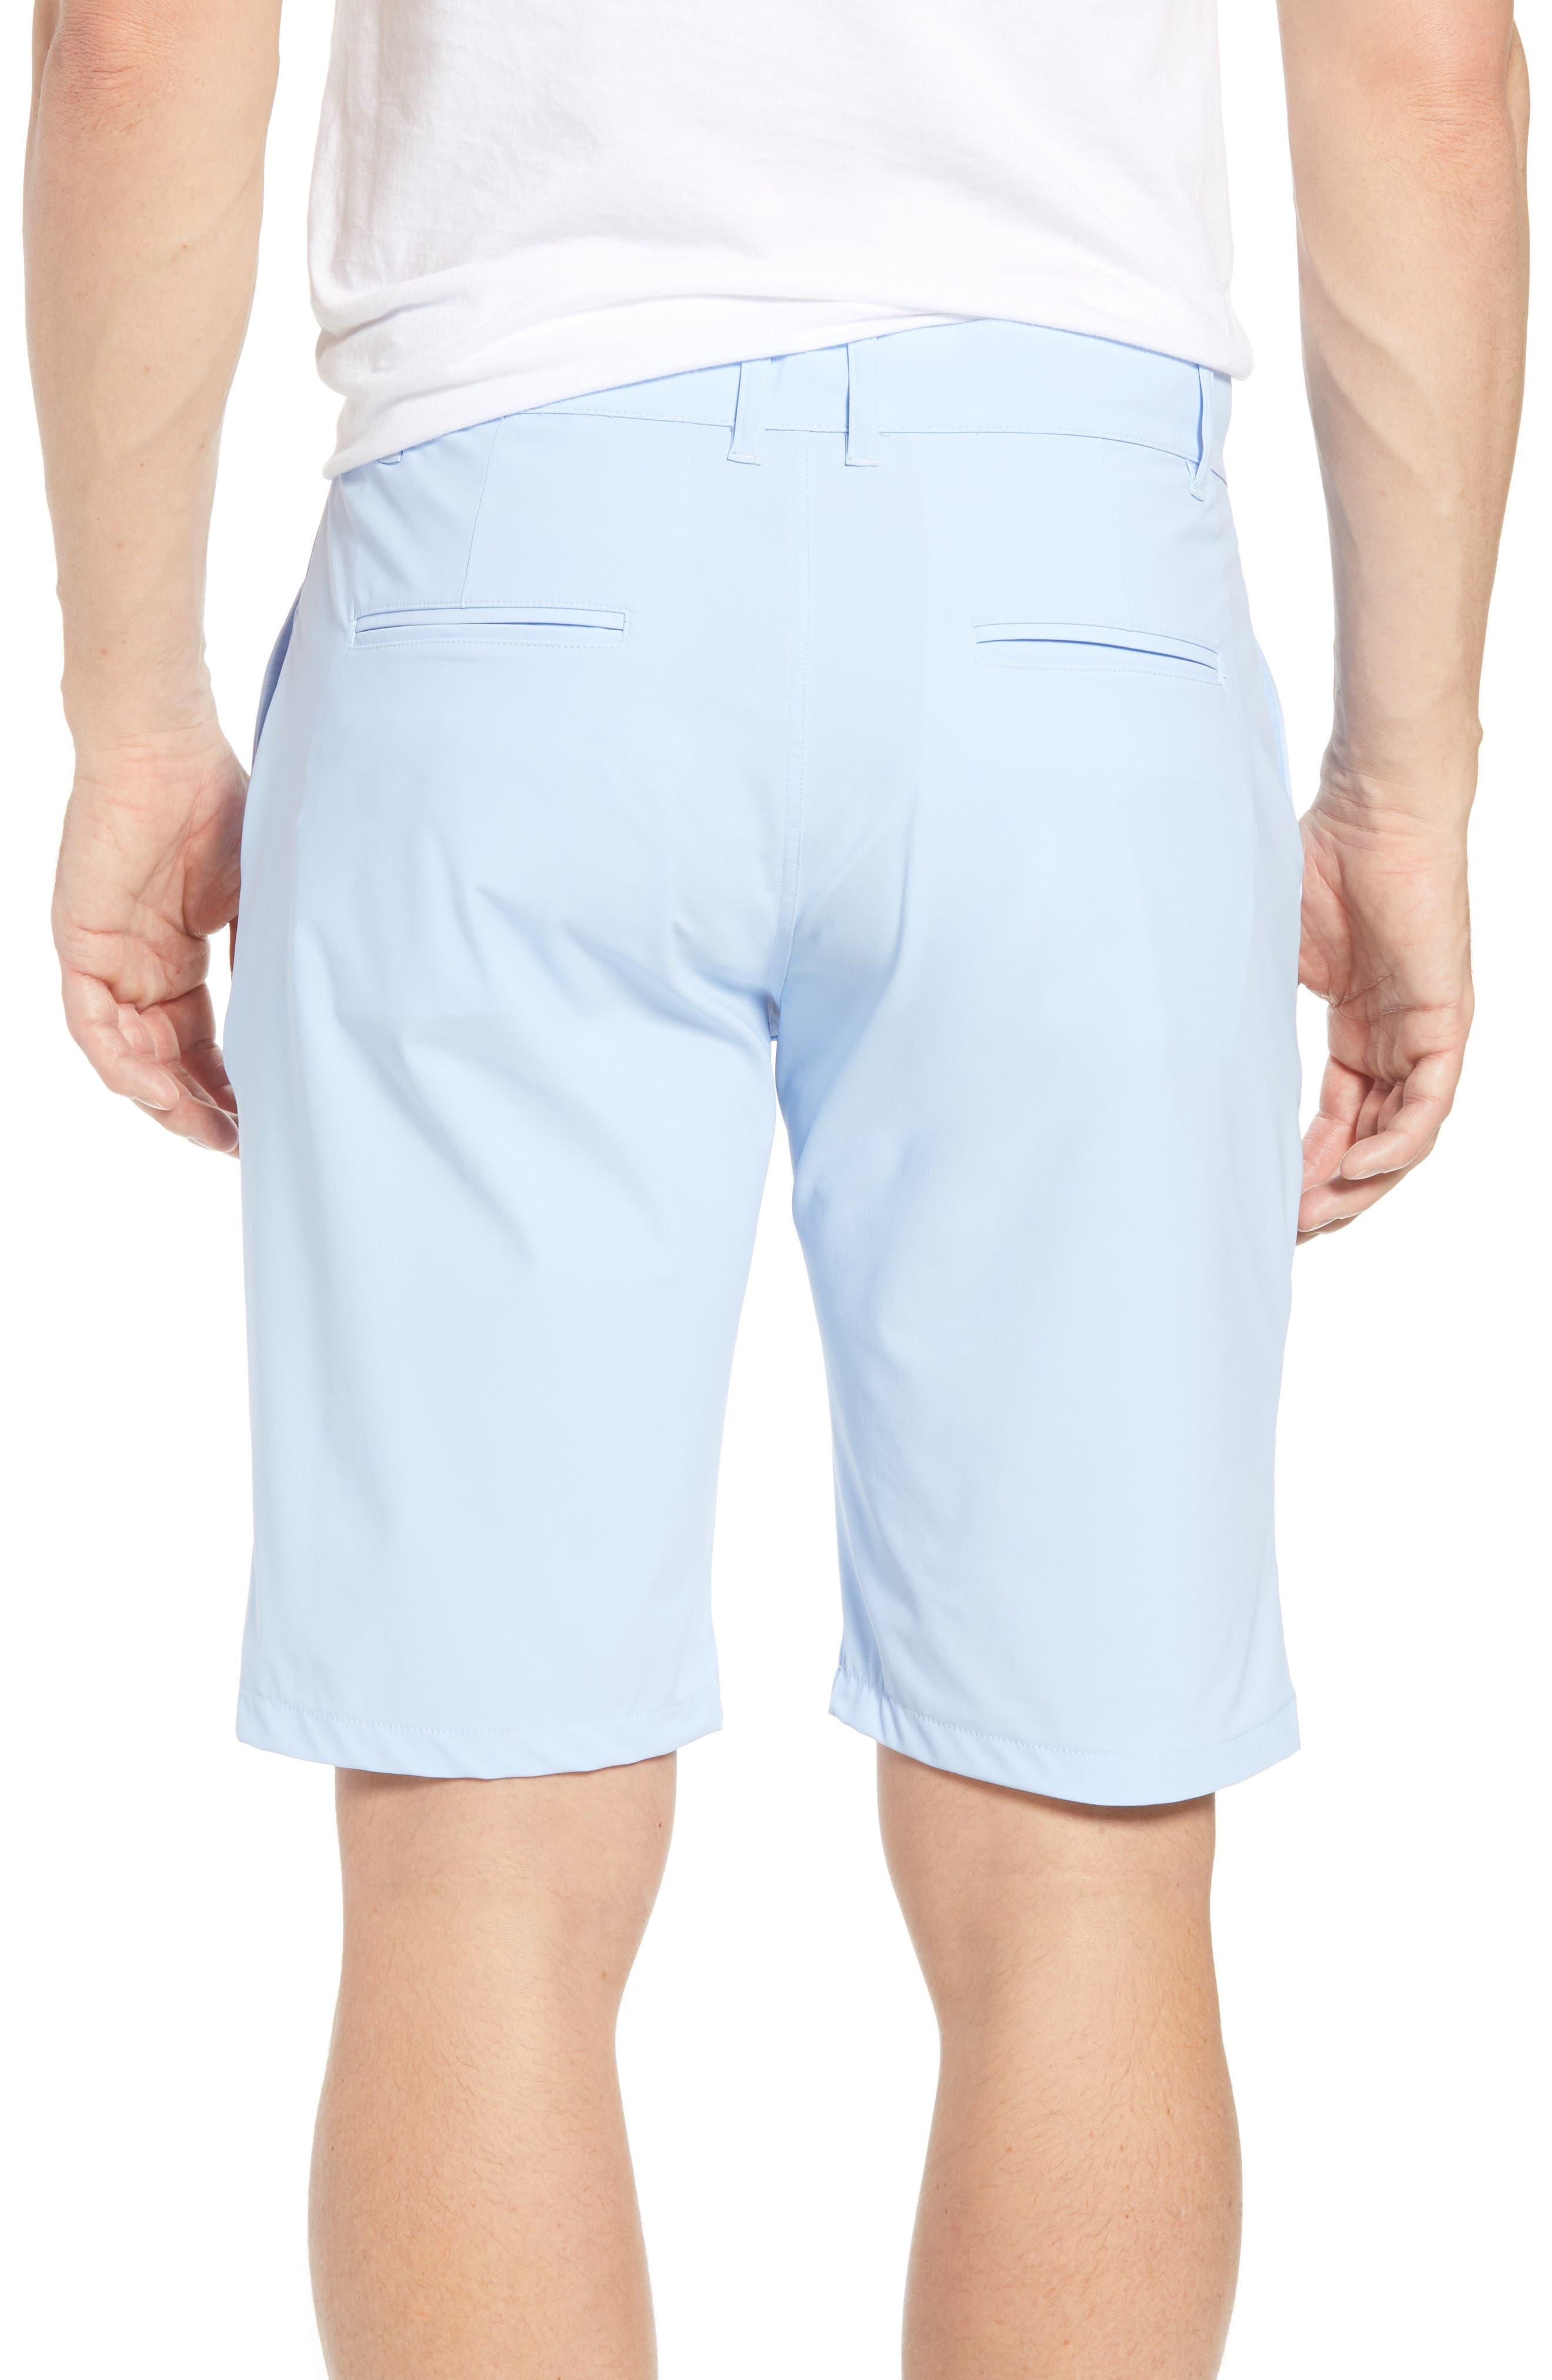 Montauk Shorts,                             Alternate thumbnail 2, color,                             WOLF